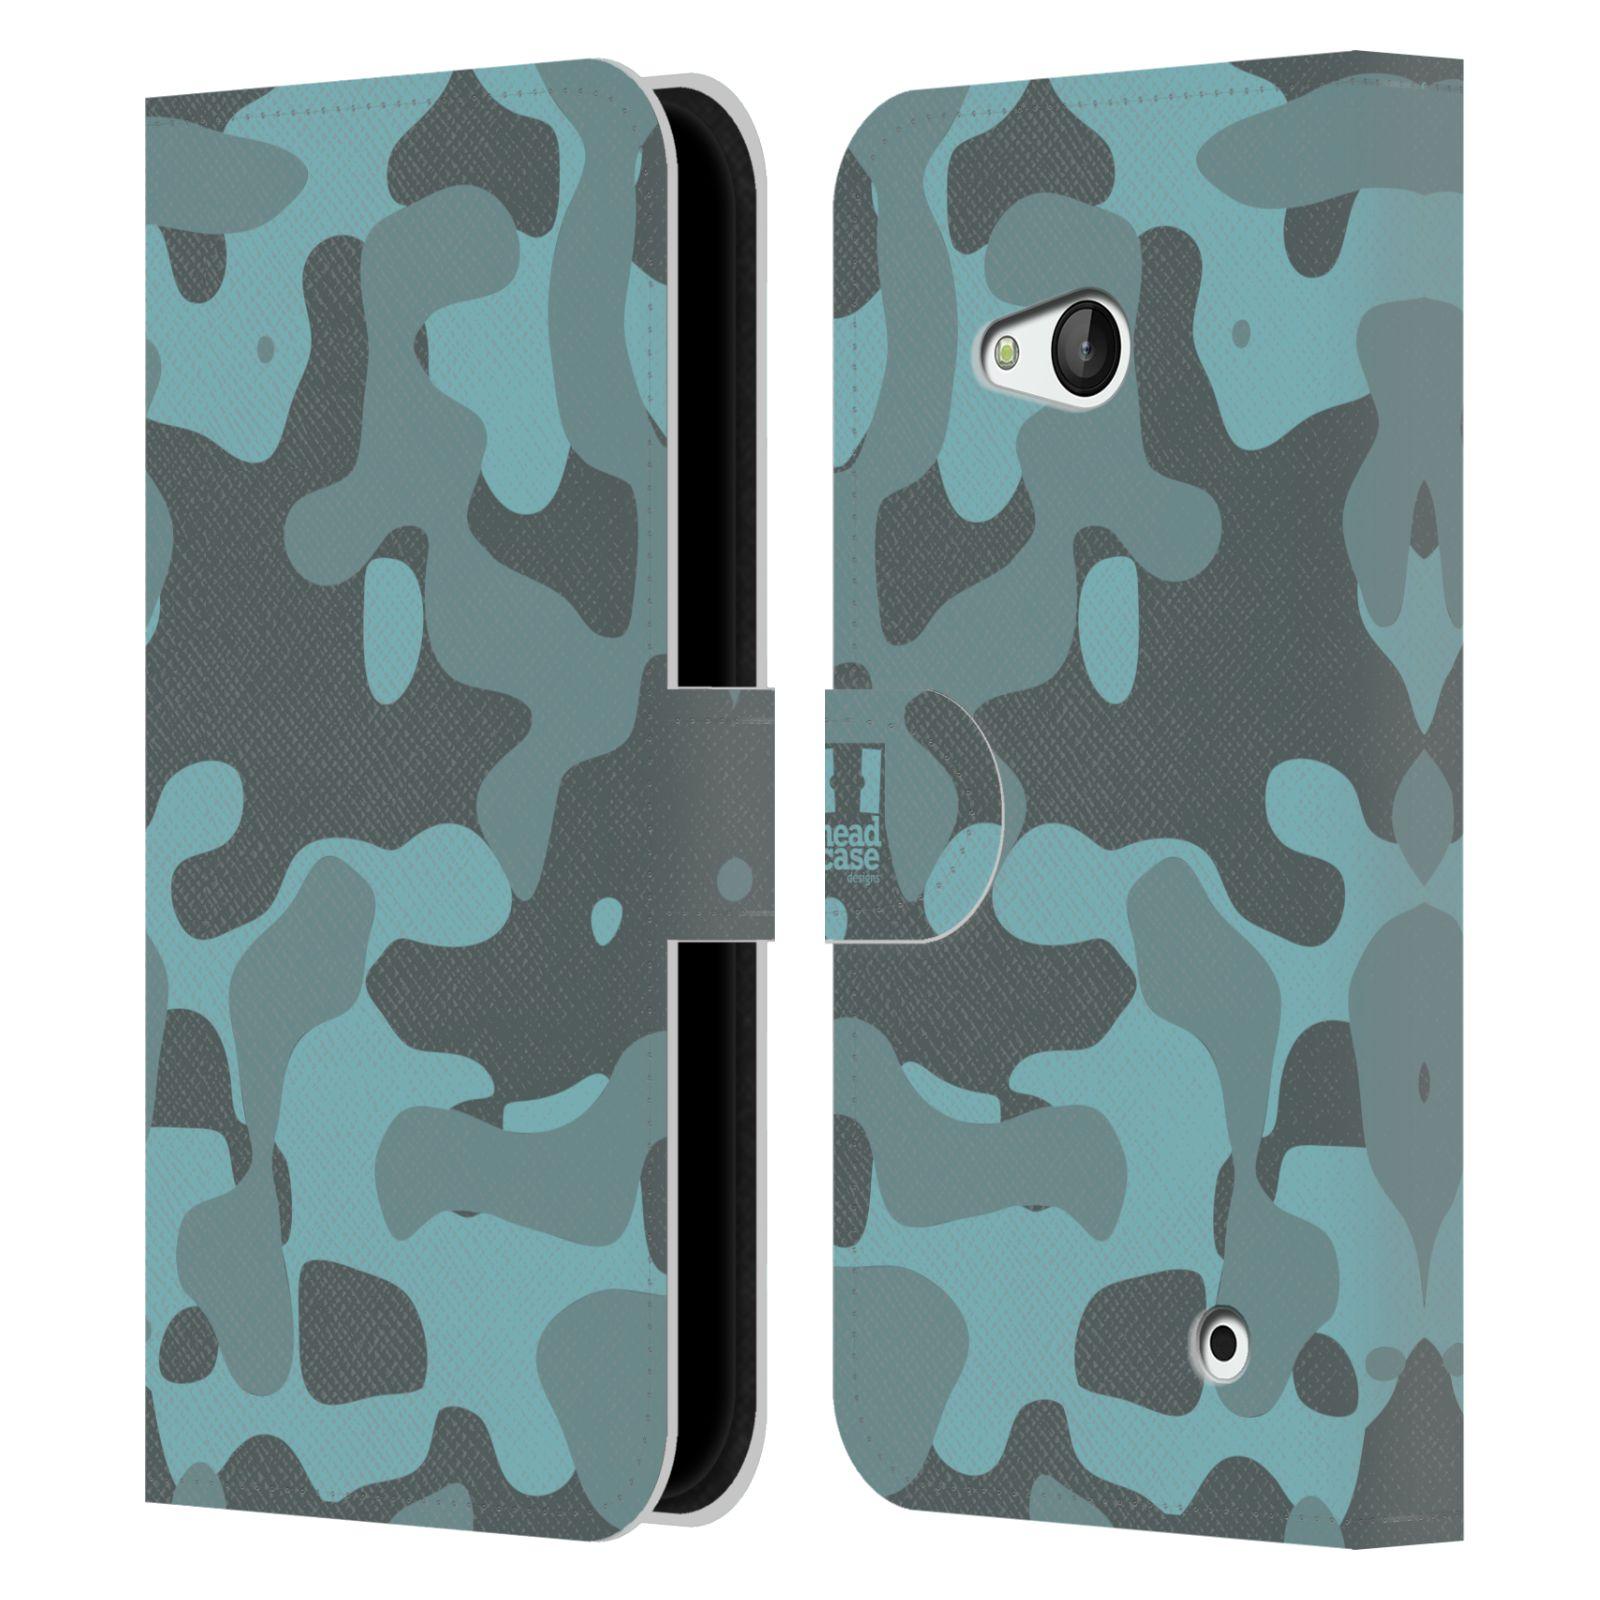 HEAD CASE Flipové pouzdro pro mobil NOKIA / MICROSOFT LUMIA 640 / LUMIA 640 DUAL lehká barevná kamufláž modrá